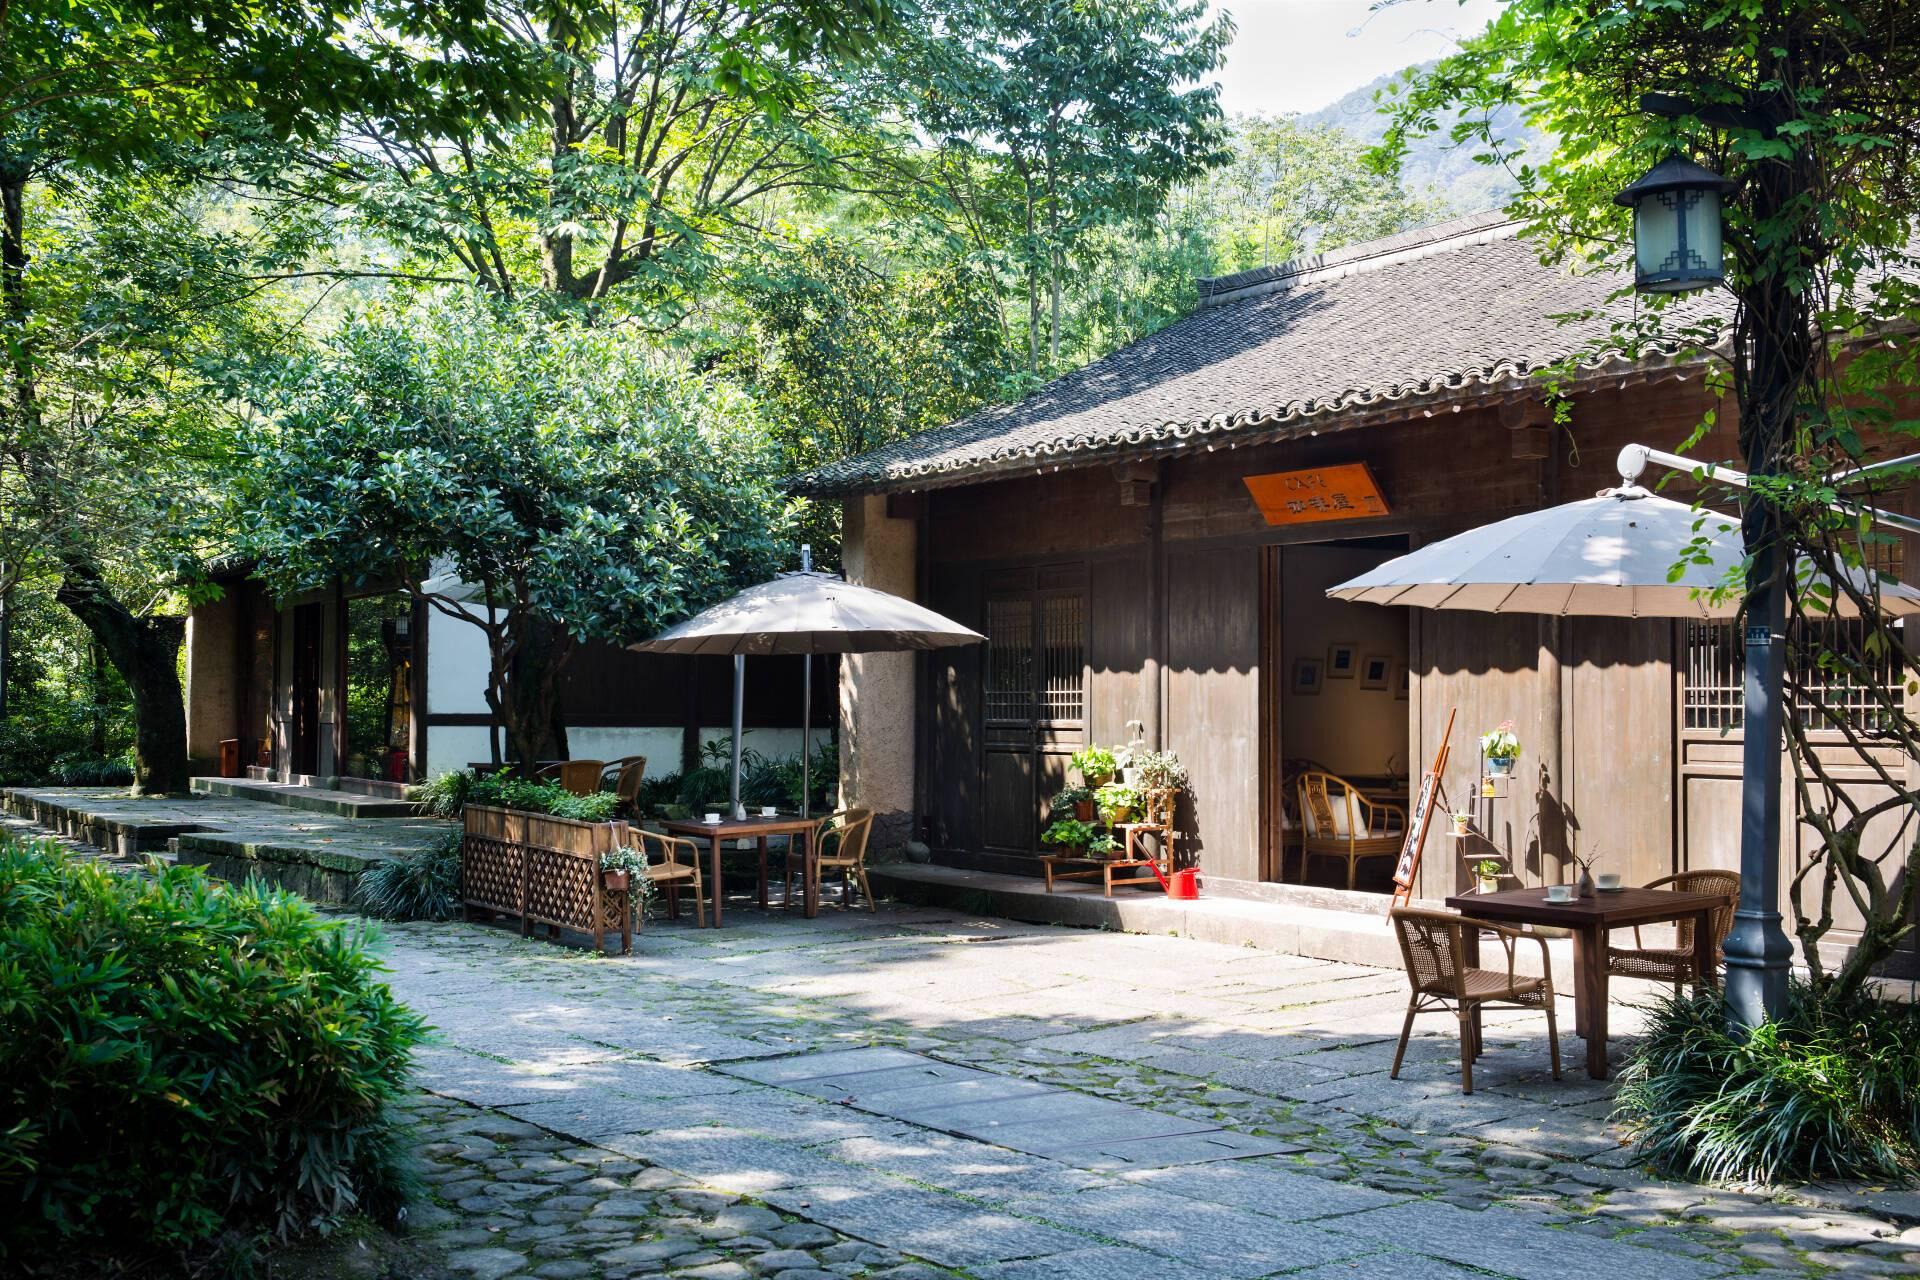 Amanfayun Hangzhou Cafe